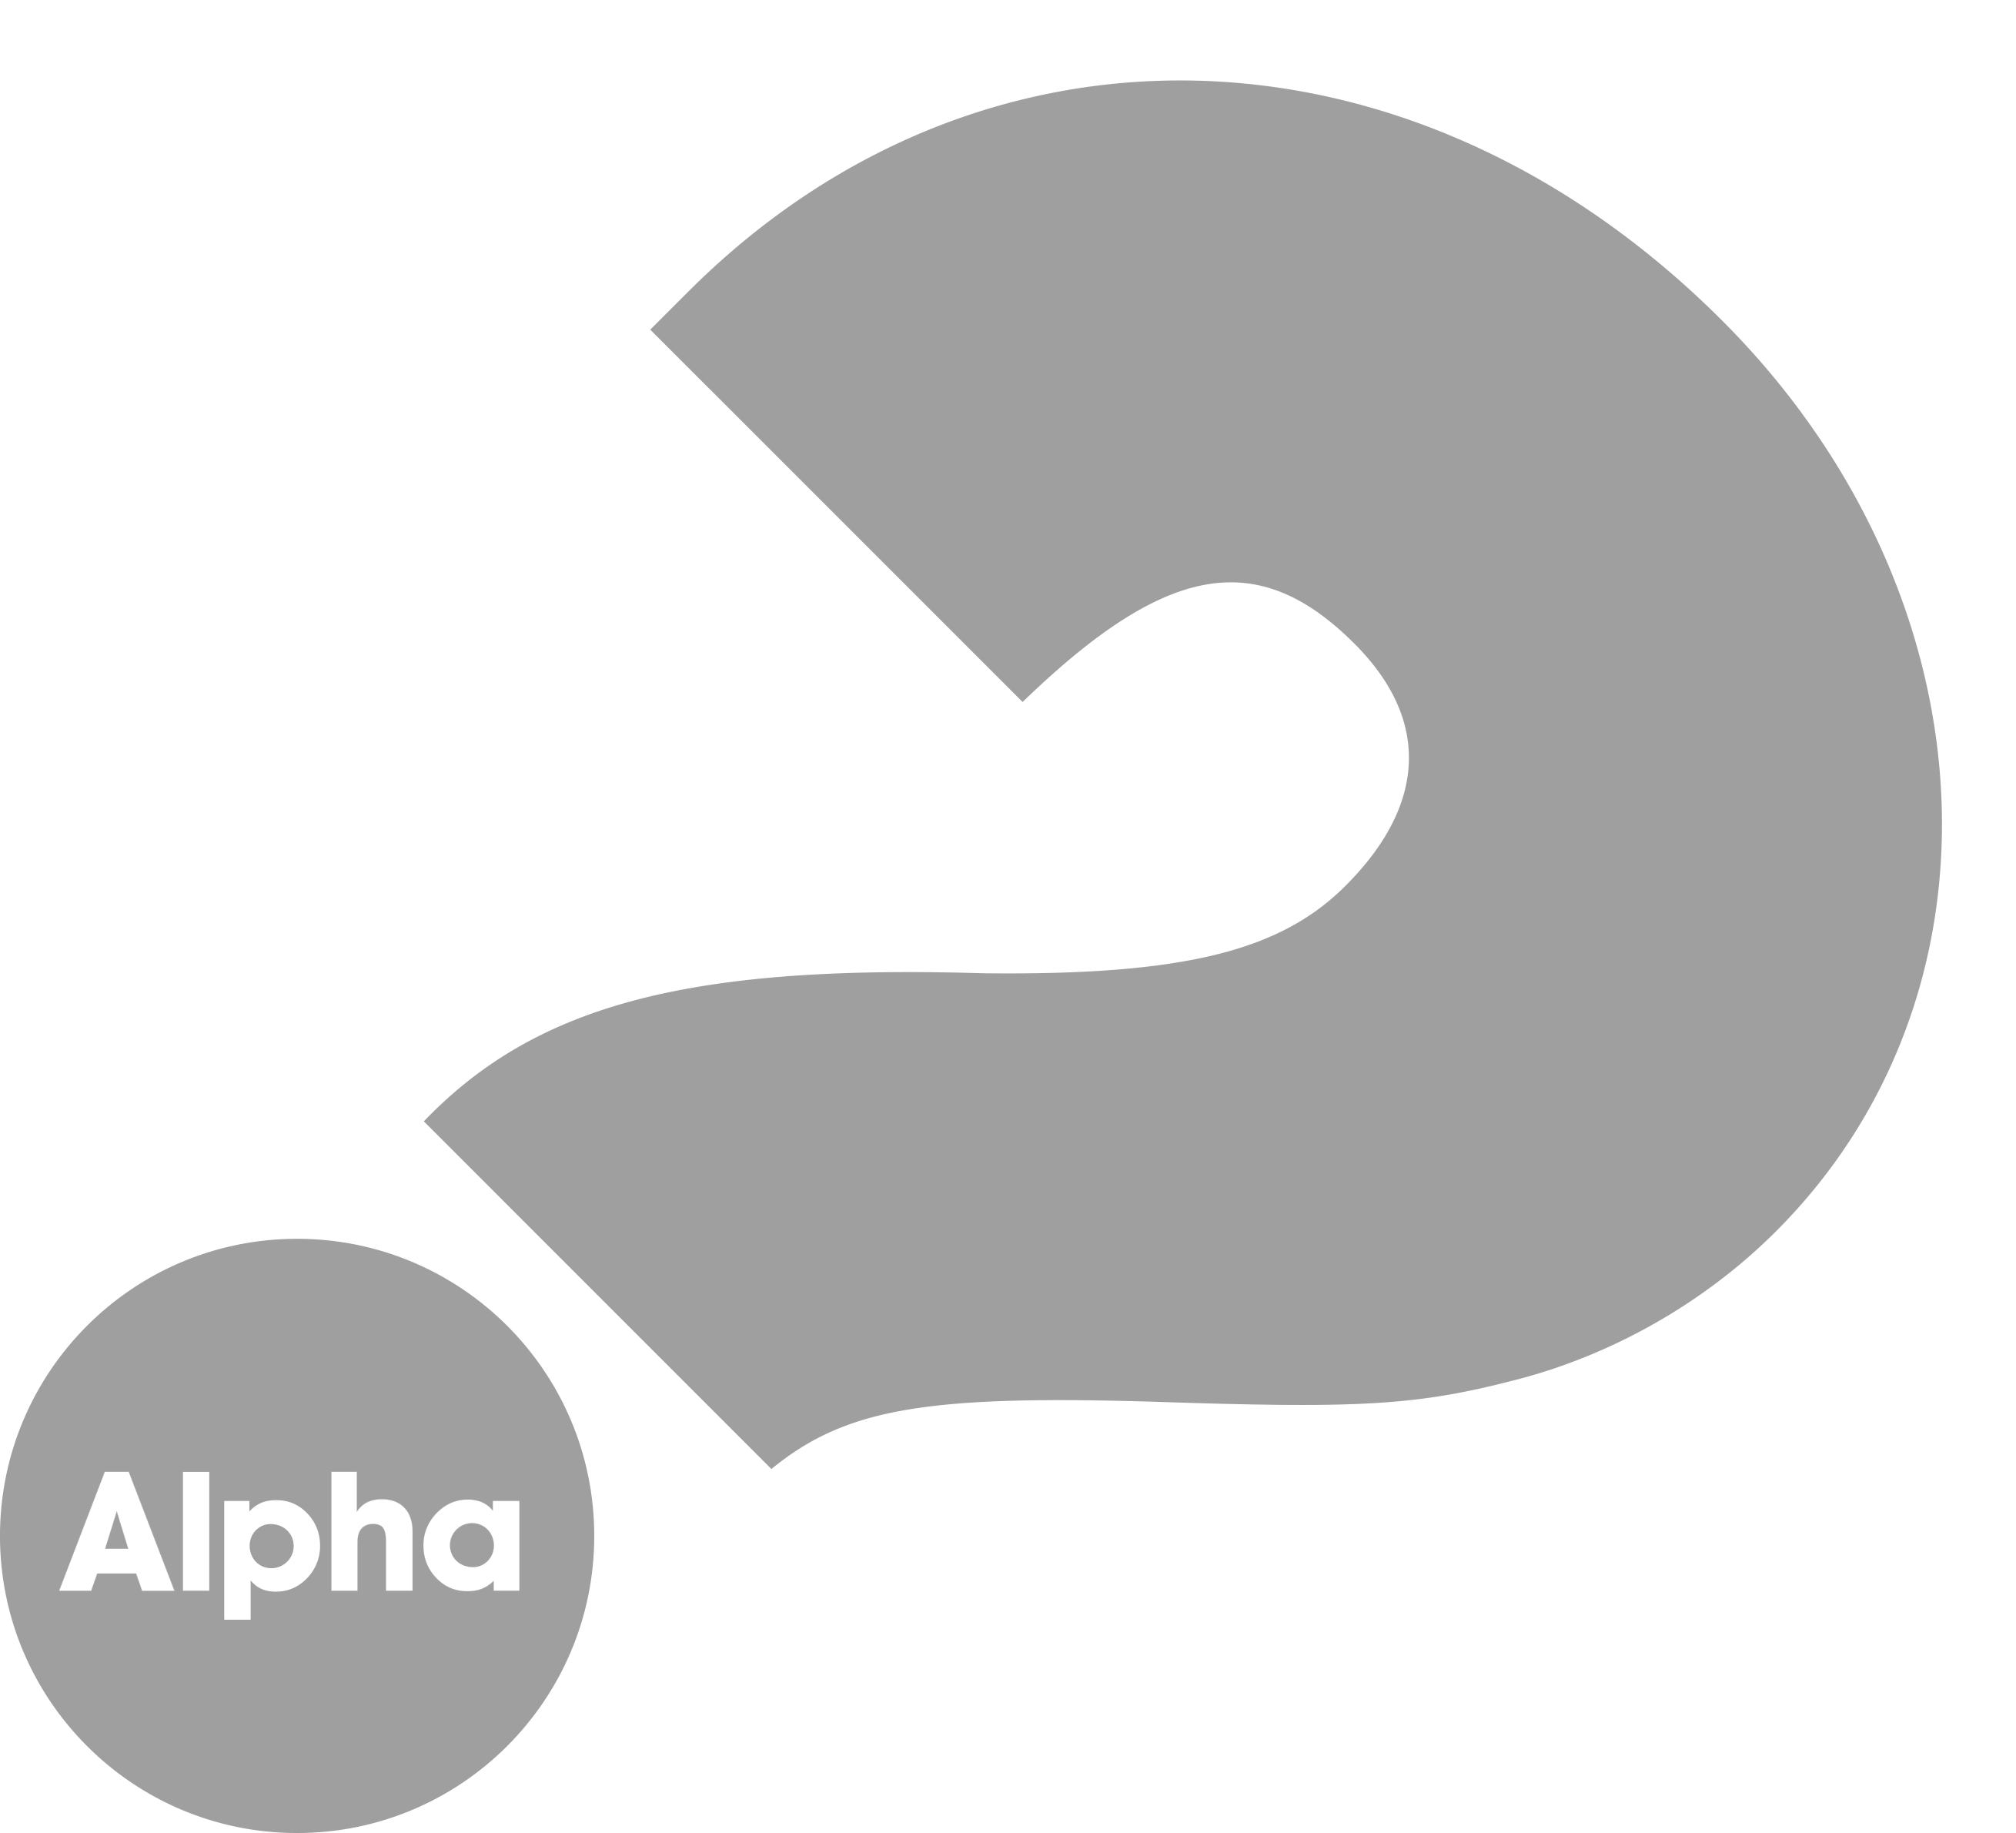 Alpha mark gray 1